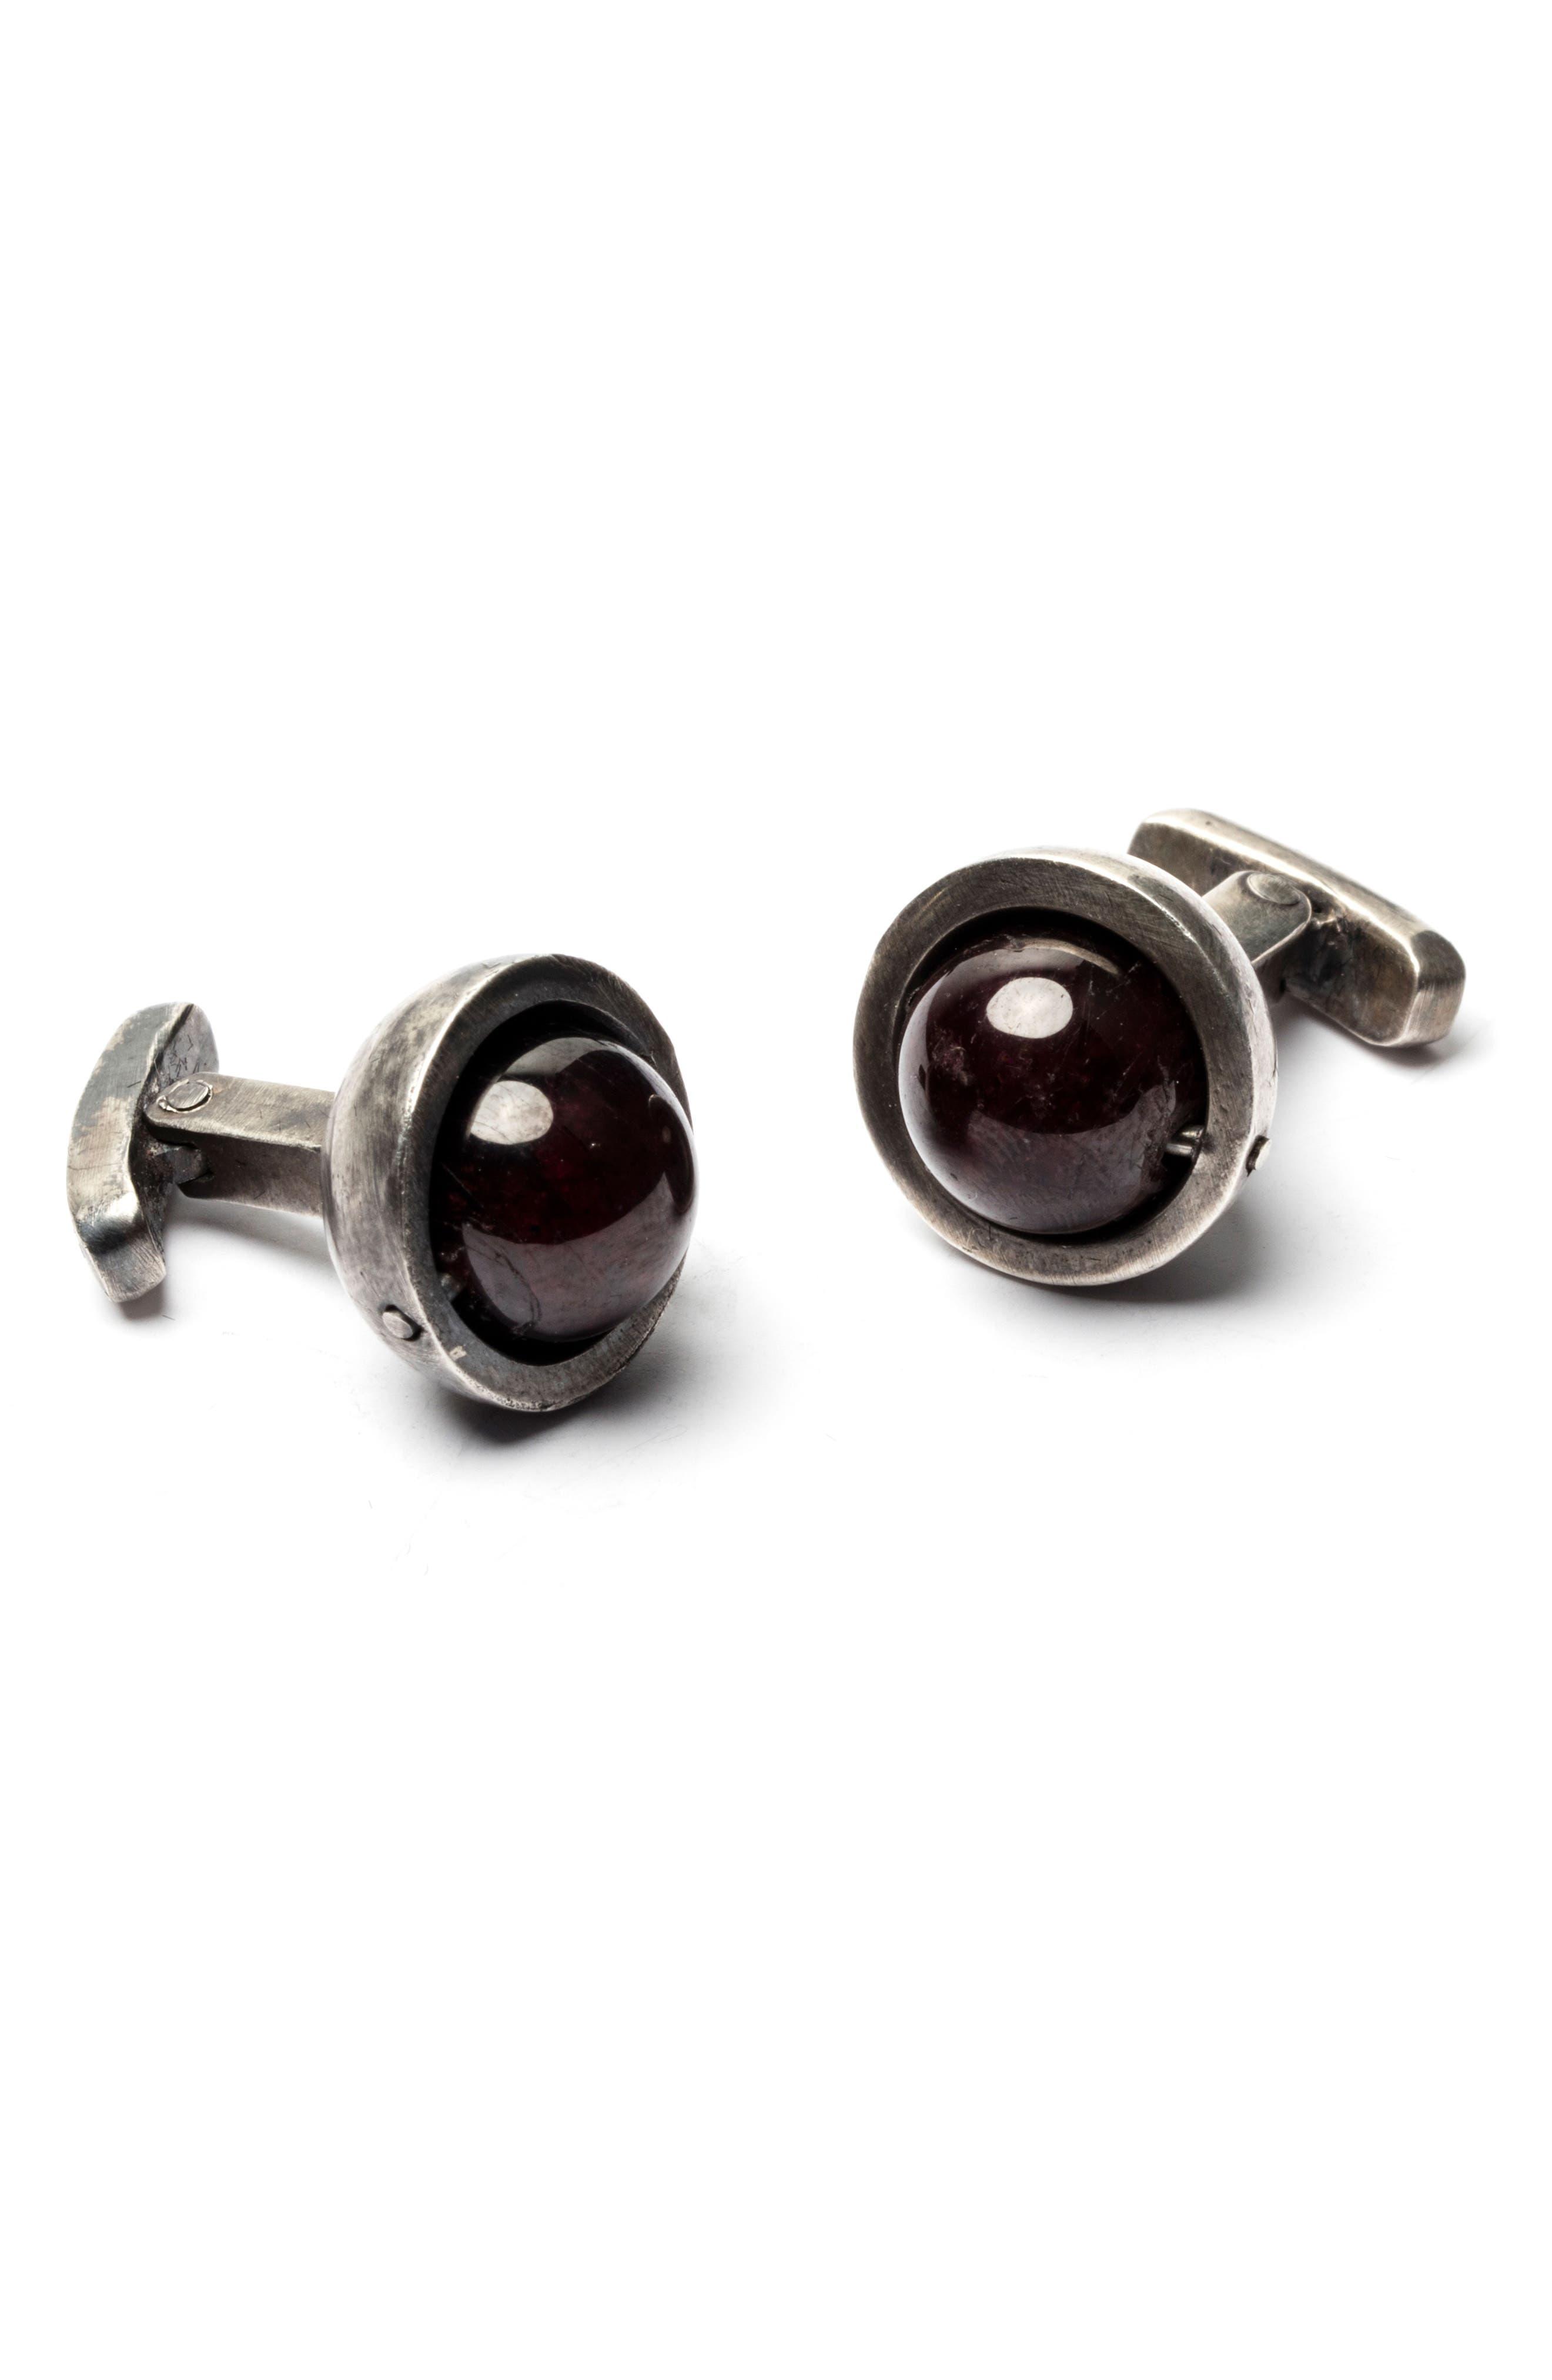 Spinning Garnet Cuff Links,                         Main,                         color, Silver/Burgundy